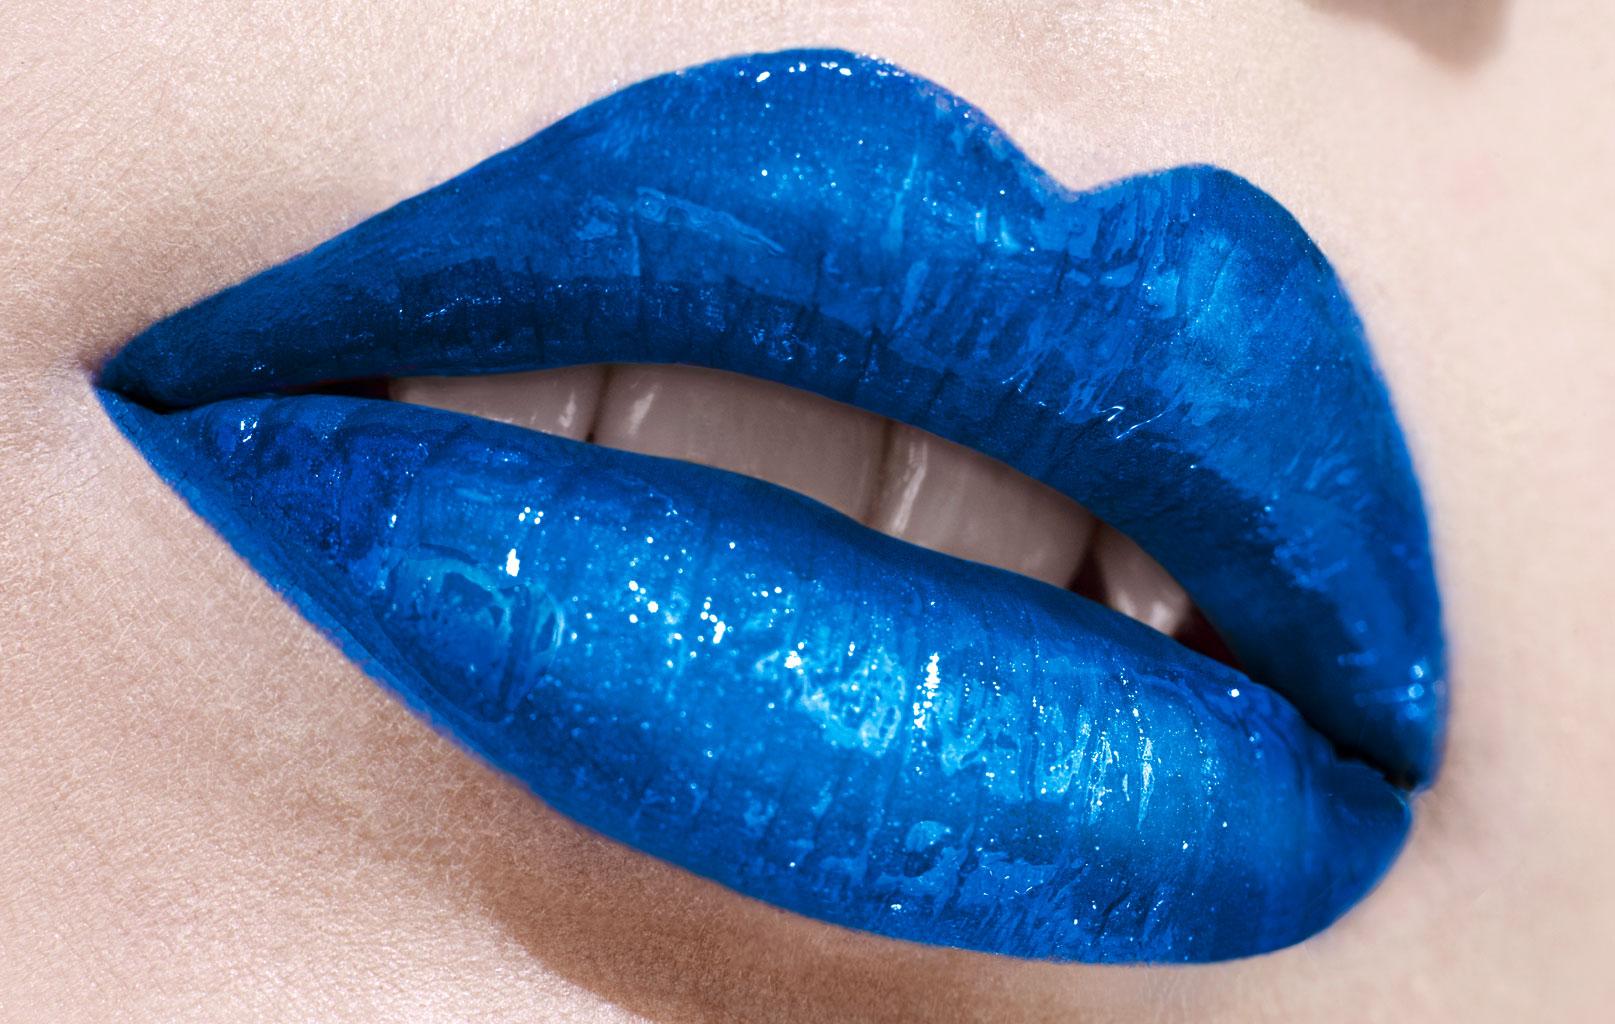 Beauty_blau61194M.jpg